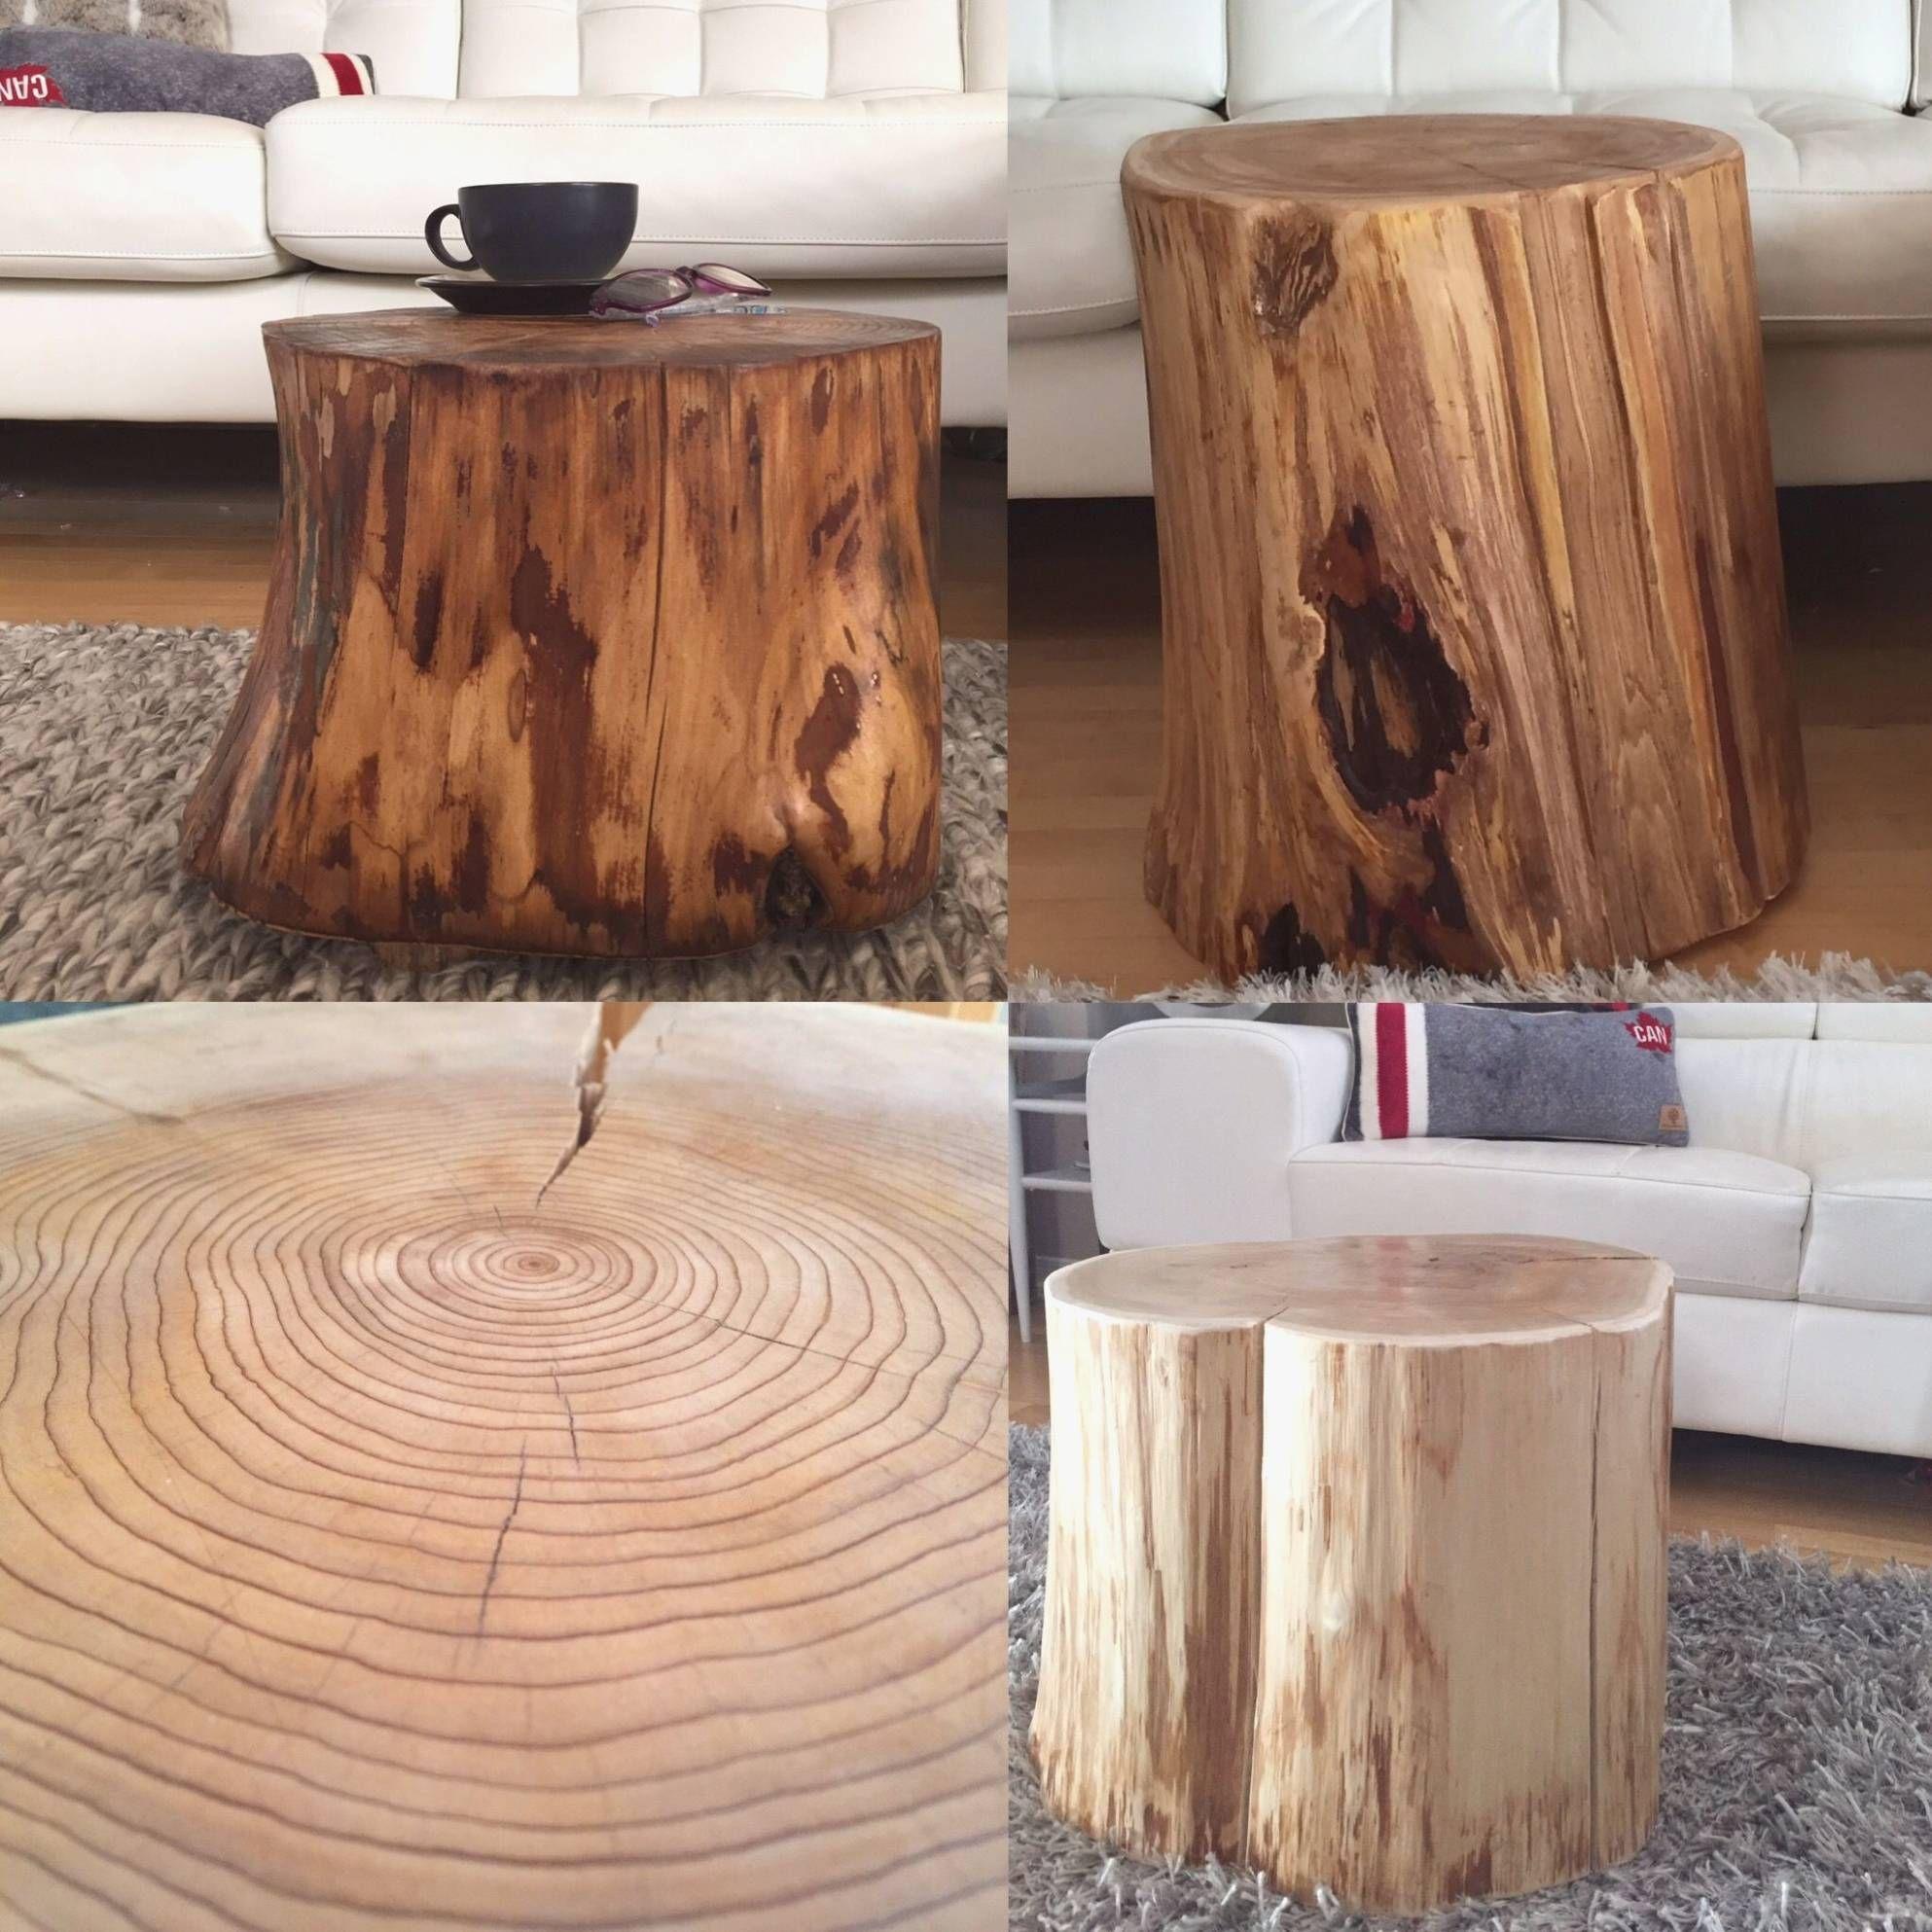 Diy Wood Coffee Table More Image Visite Coffee Table Coffee Table Wood Log Table [ 1986 x 1986 Pixel ]